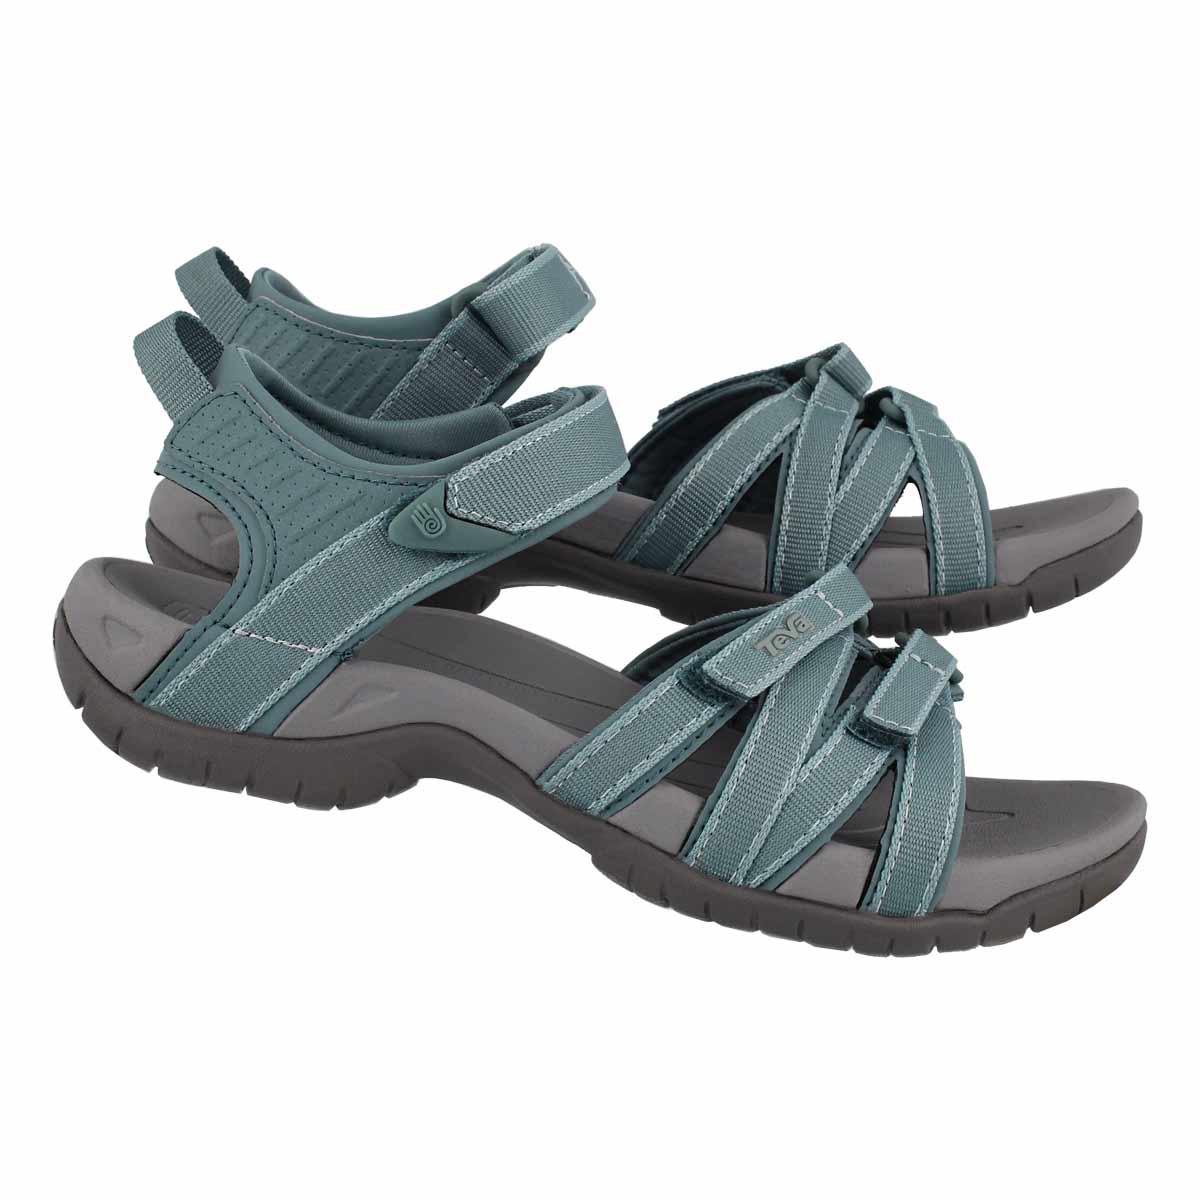 Lds Tirra north atlantic sport sandal